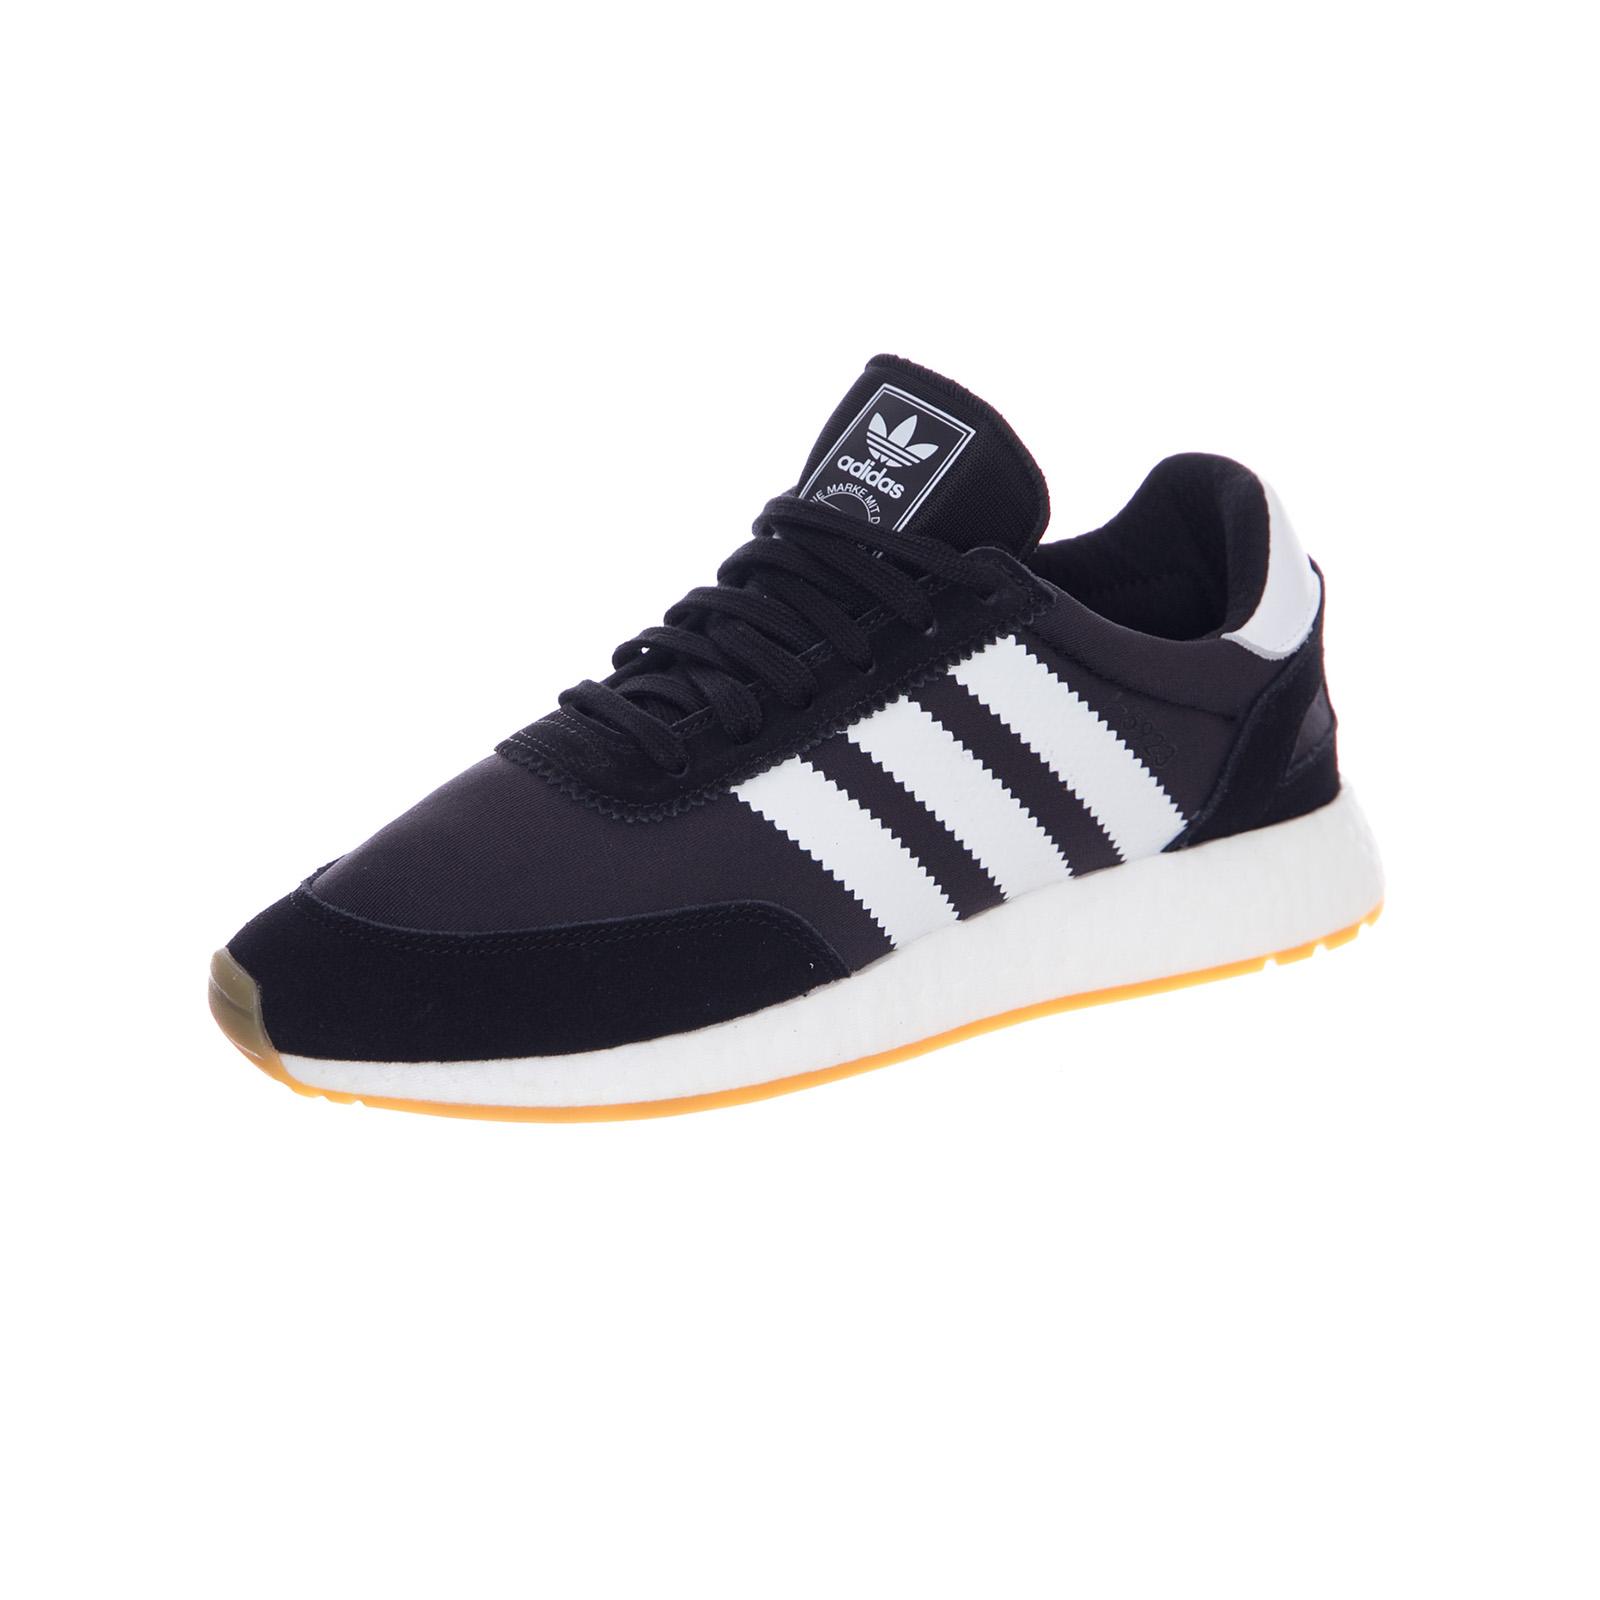 I Adidas Noir Baskets Core 5923 Noir 4rH5xrA